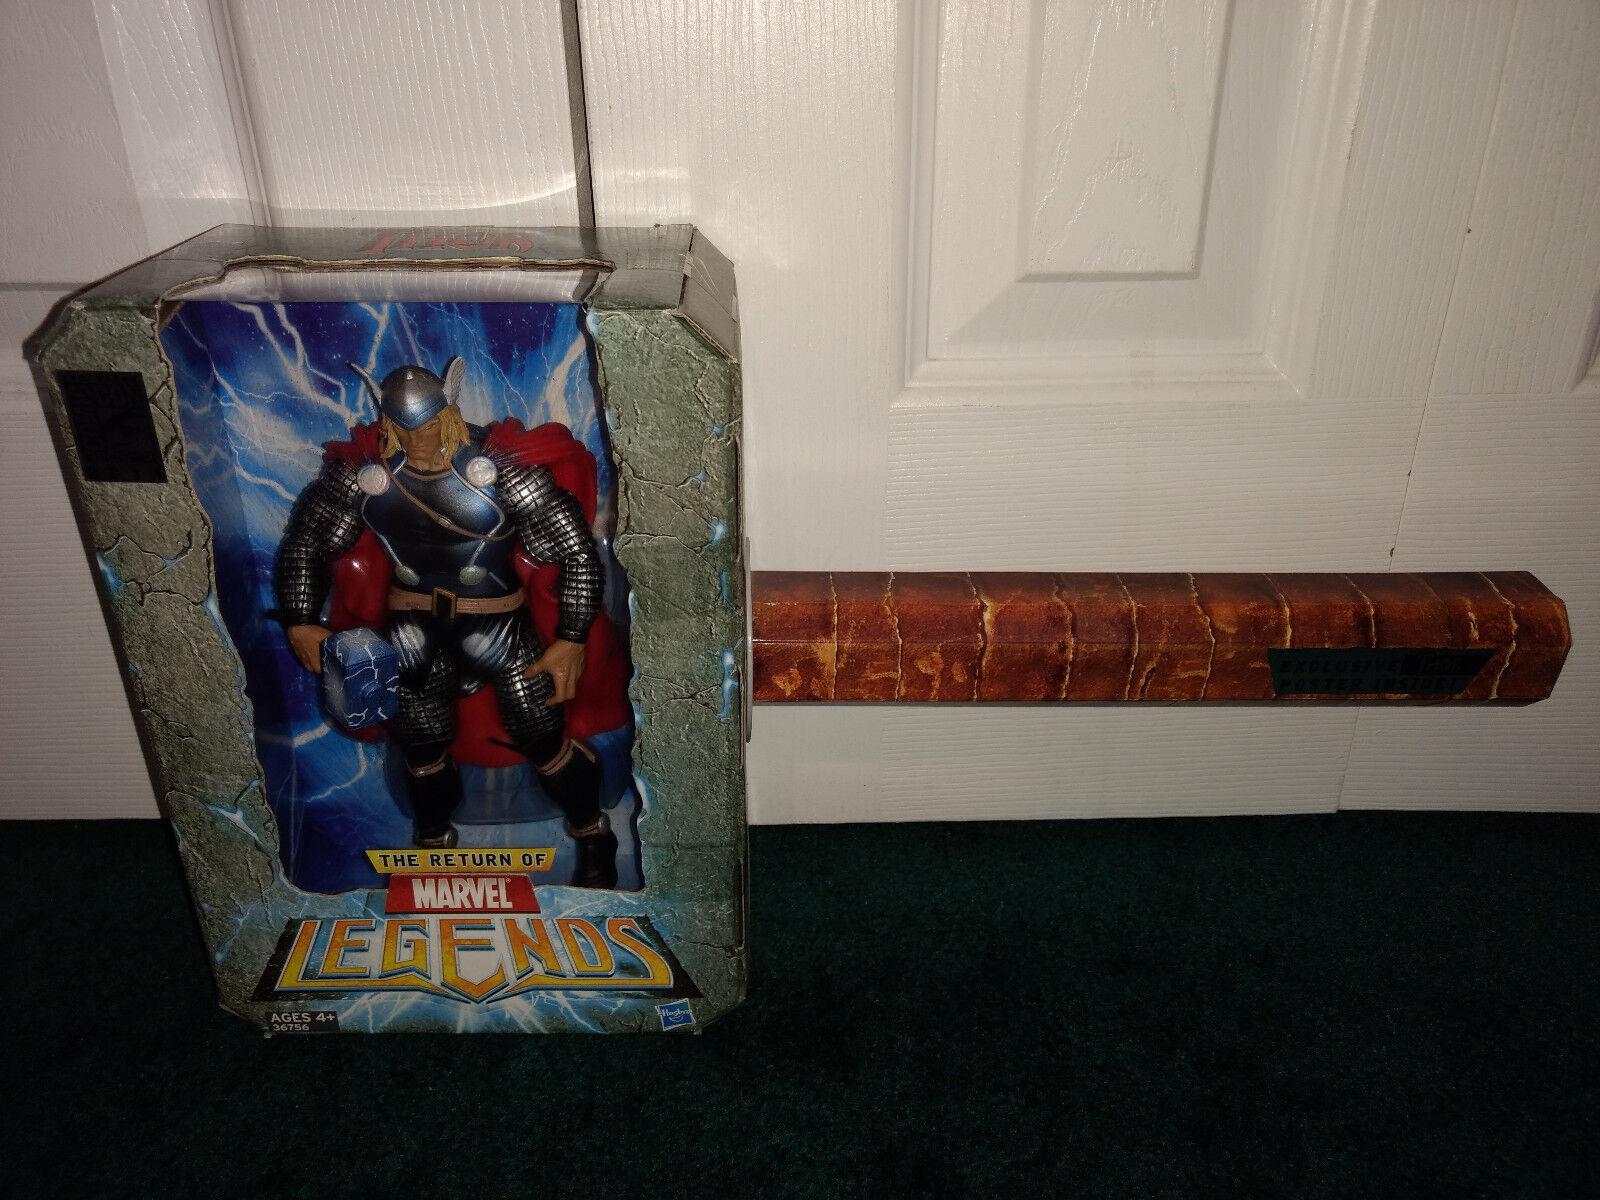 Thors hammer sdcc exklusive marvel - legenden hasbro 2011 mit exklusiven poster misp